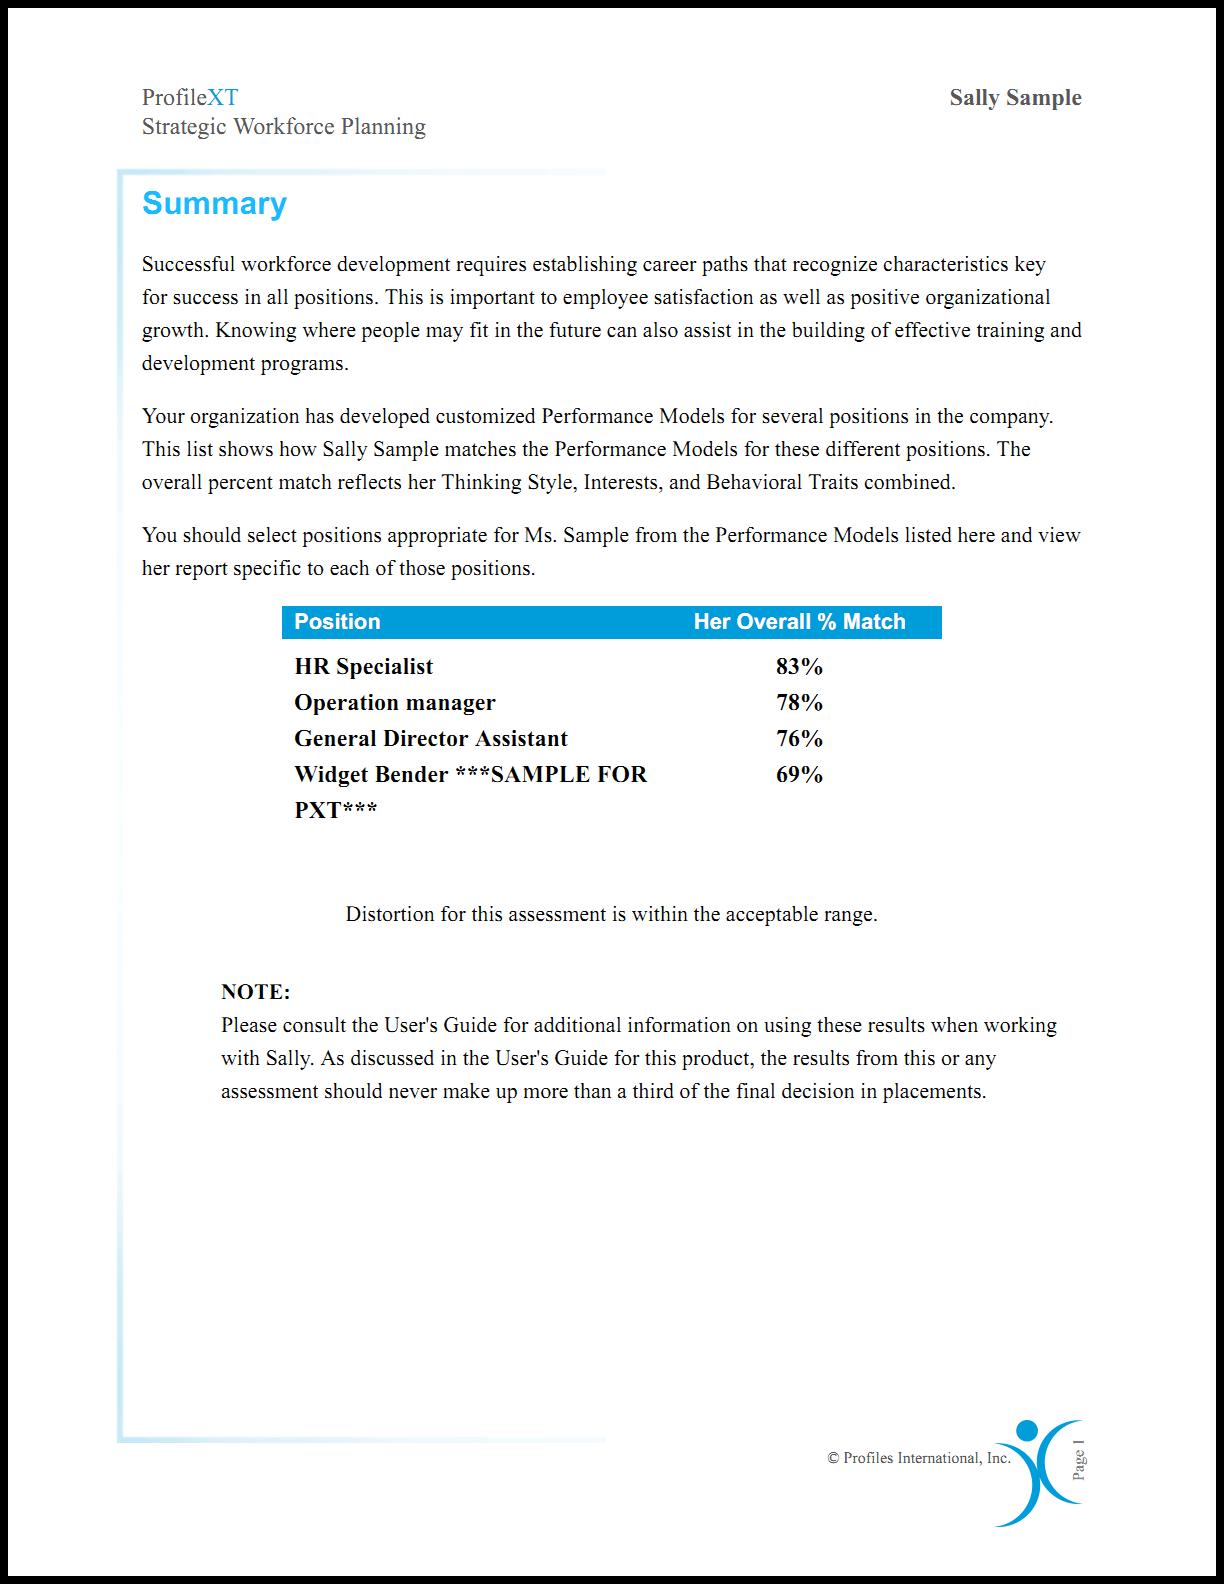 1432013158PXT_StrategicWorkforcePlanning_en_b